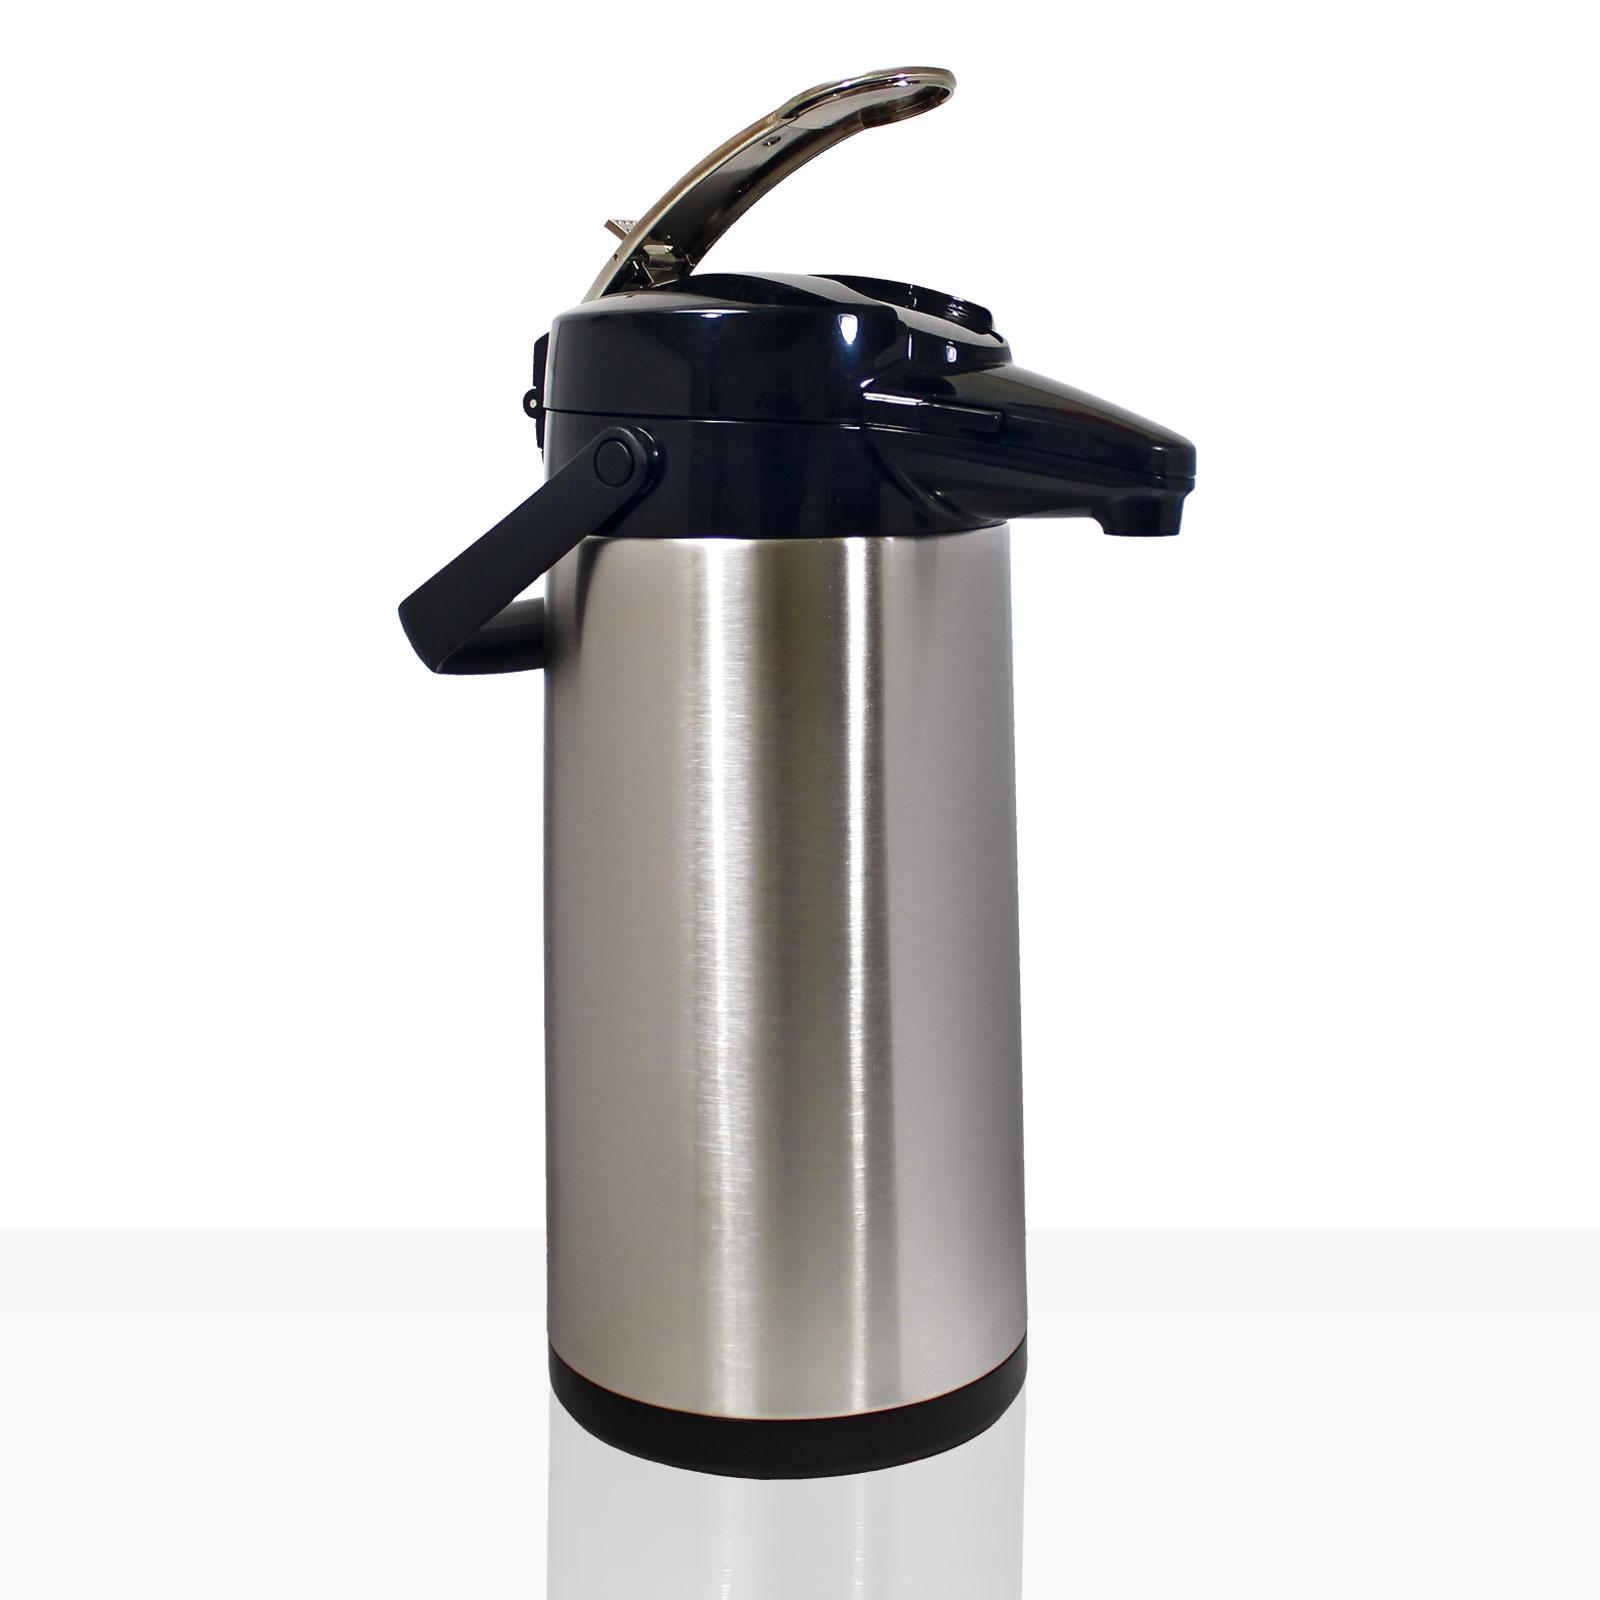 Bonamat Airpotkanne Furento für Bonamat TH10 - 2,2l Glaseinsatz - Pumpkanne